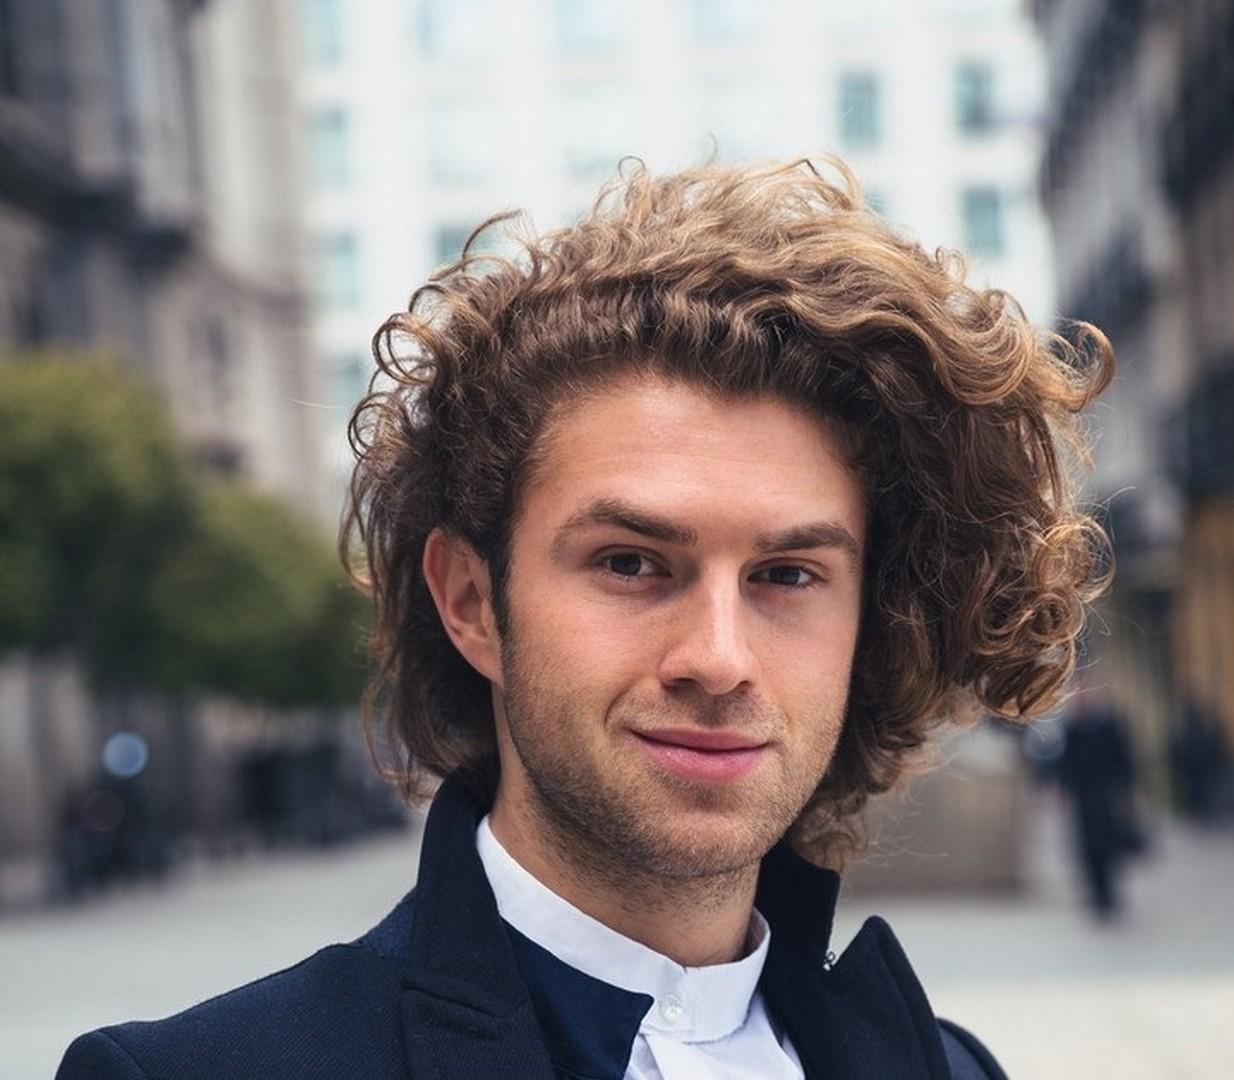 iStock 524895050 - Cortes de cabelo masculino: Dicas de cortes para apostar sem medo